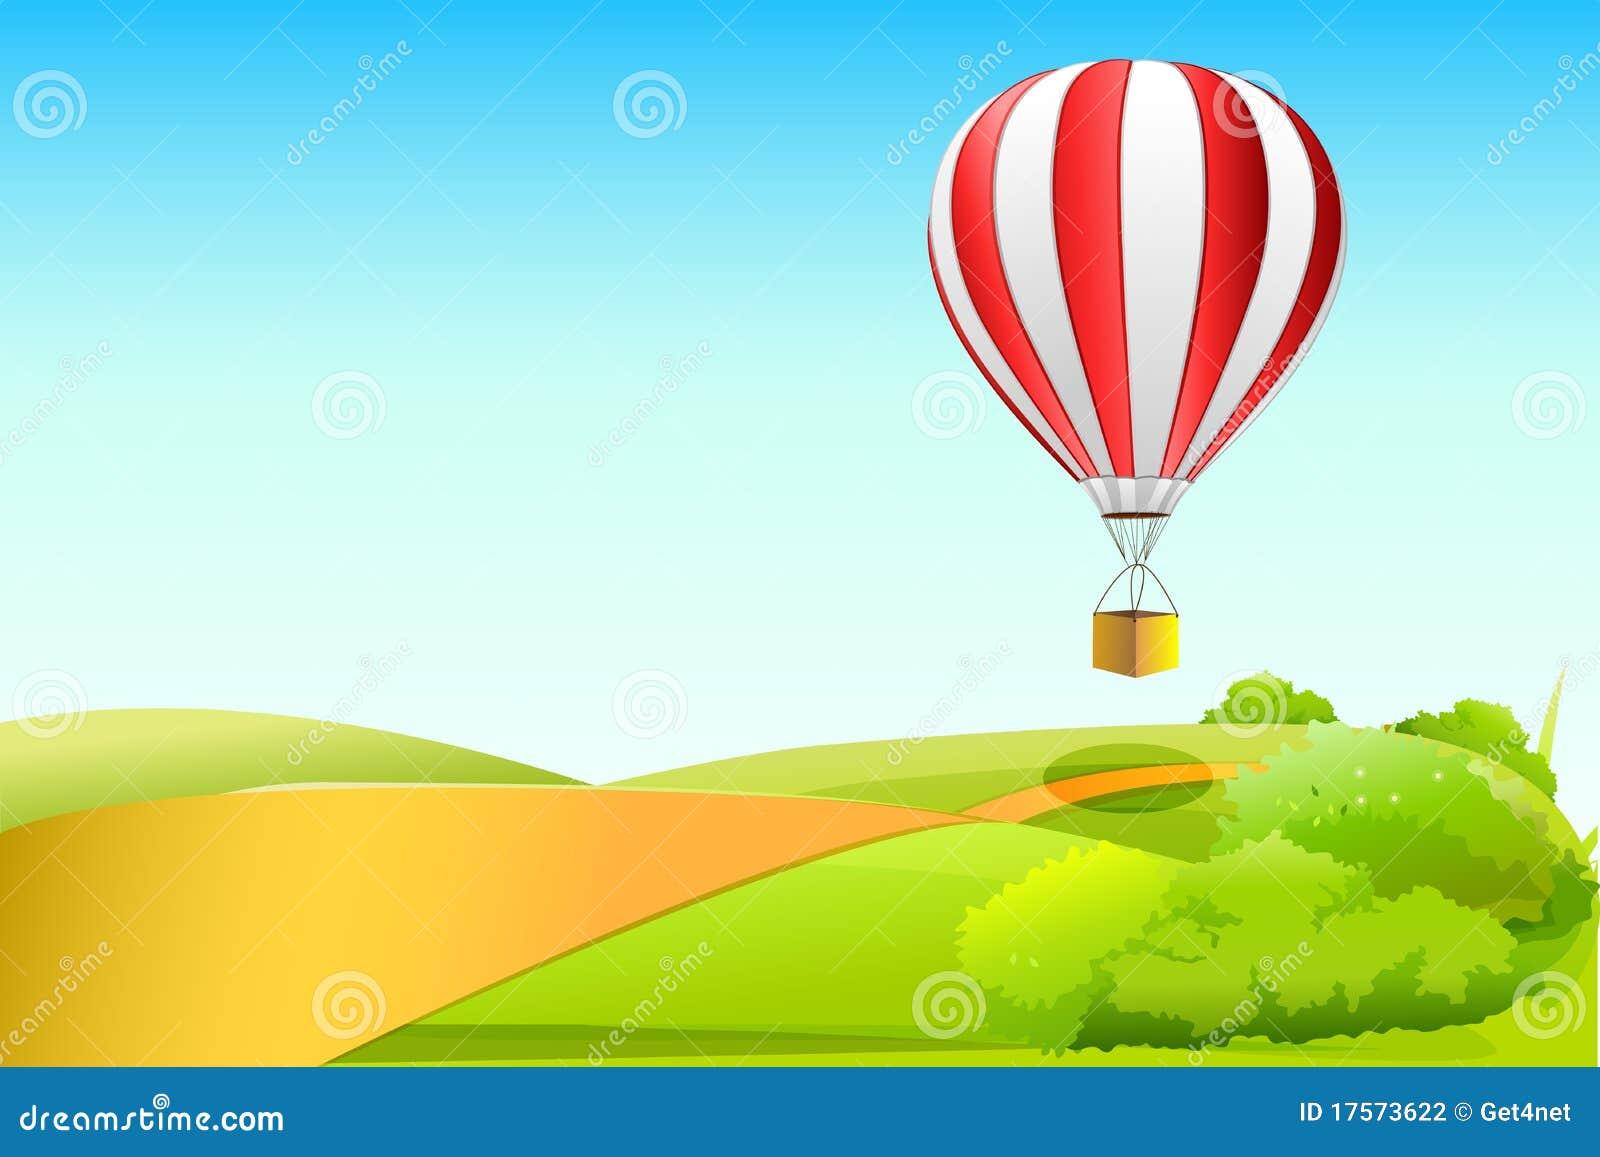 Parachute Clipart Parachute Clipart 1114104